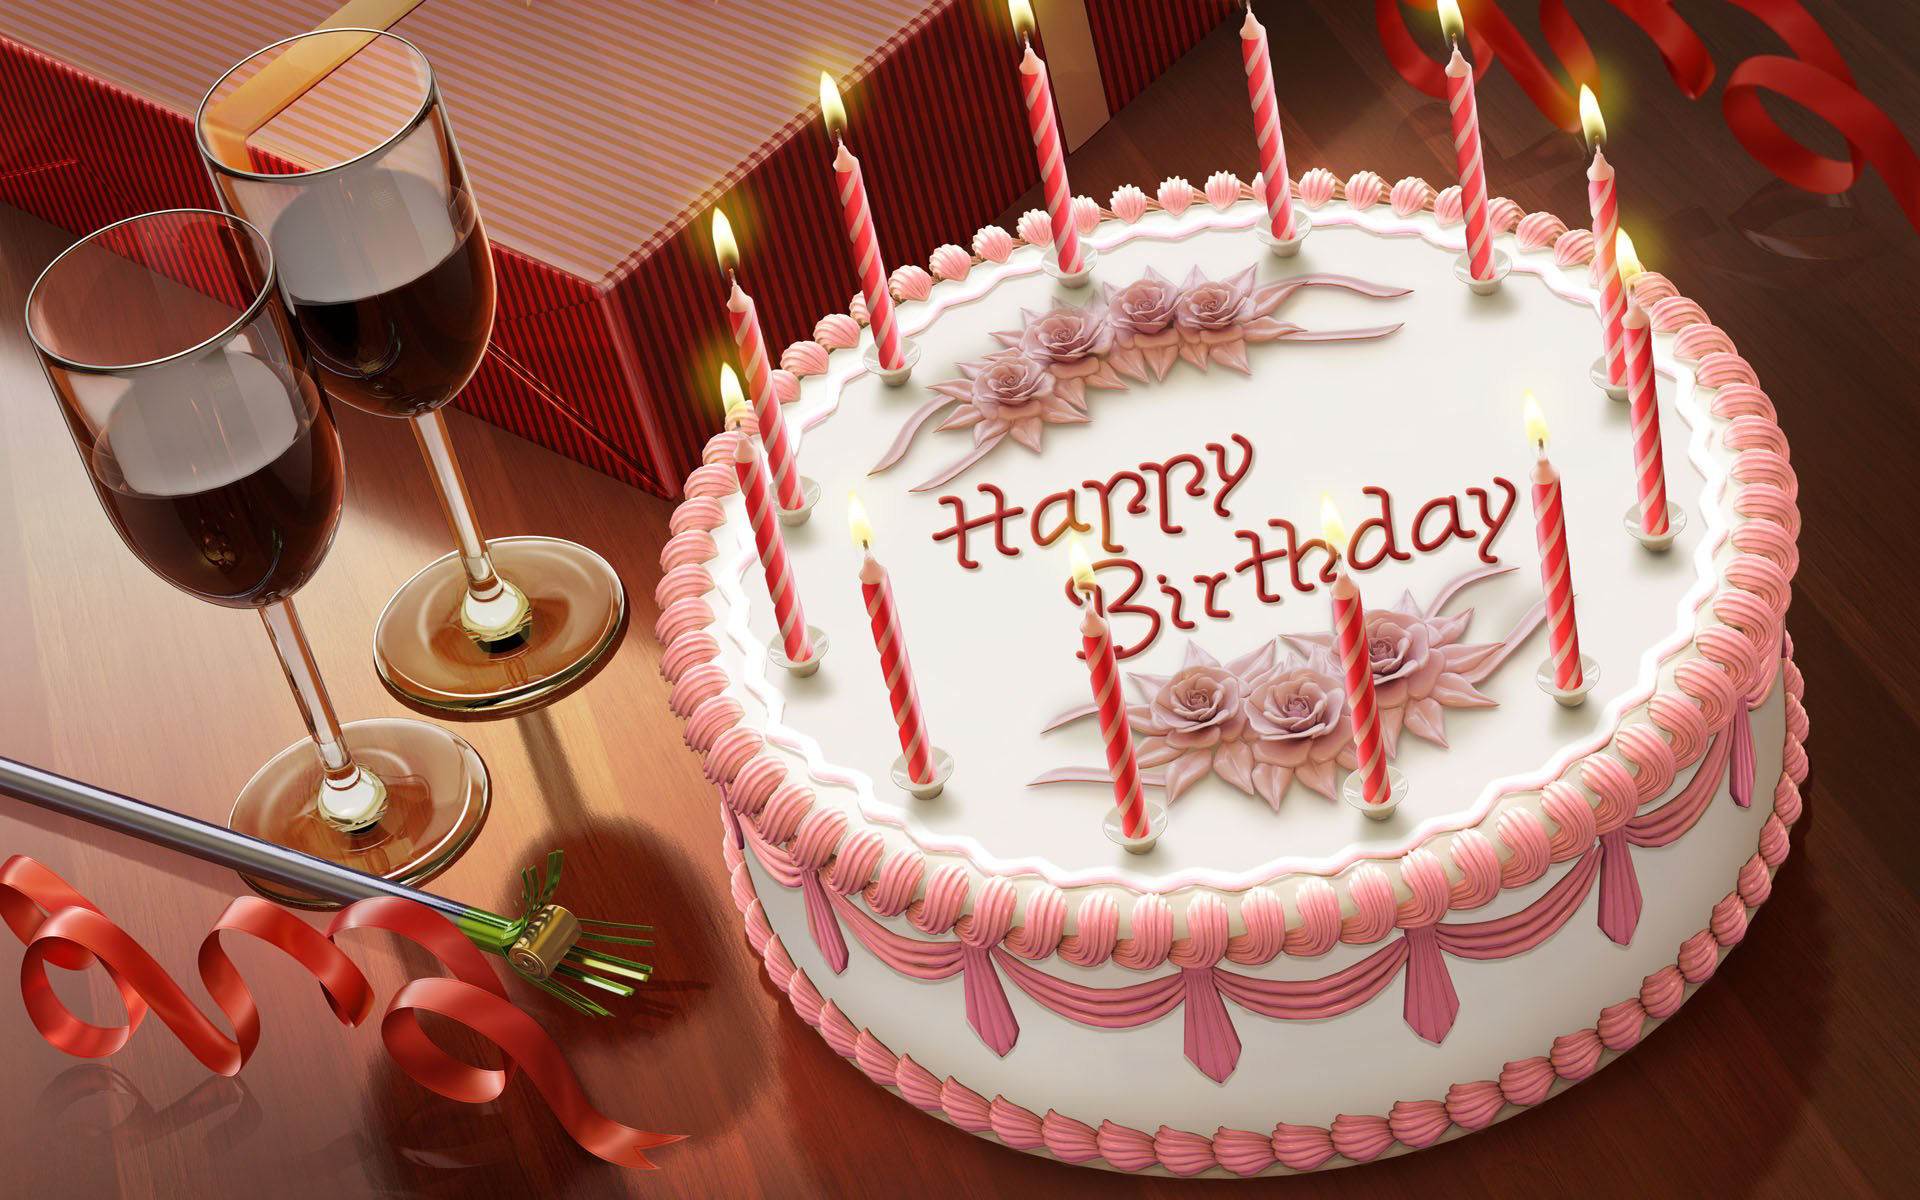 Deepak Birthday Cake Image Download : 1920px